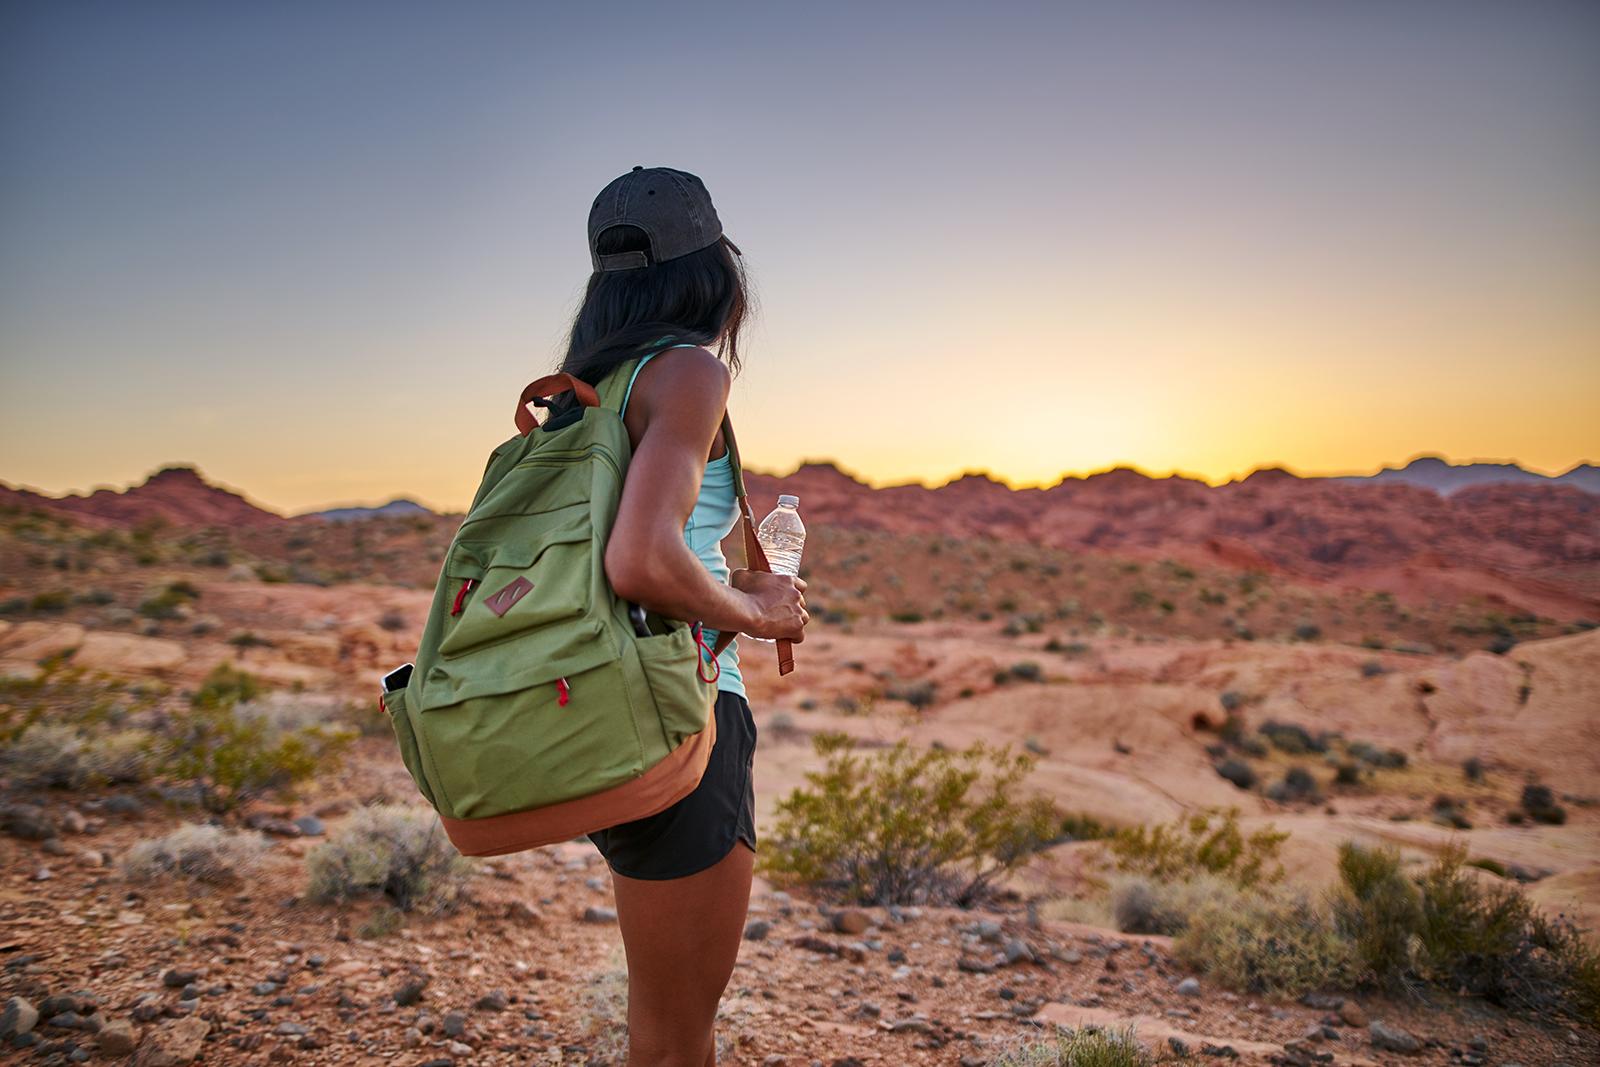 Woman backpacking in desert